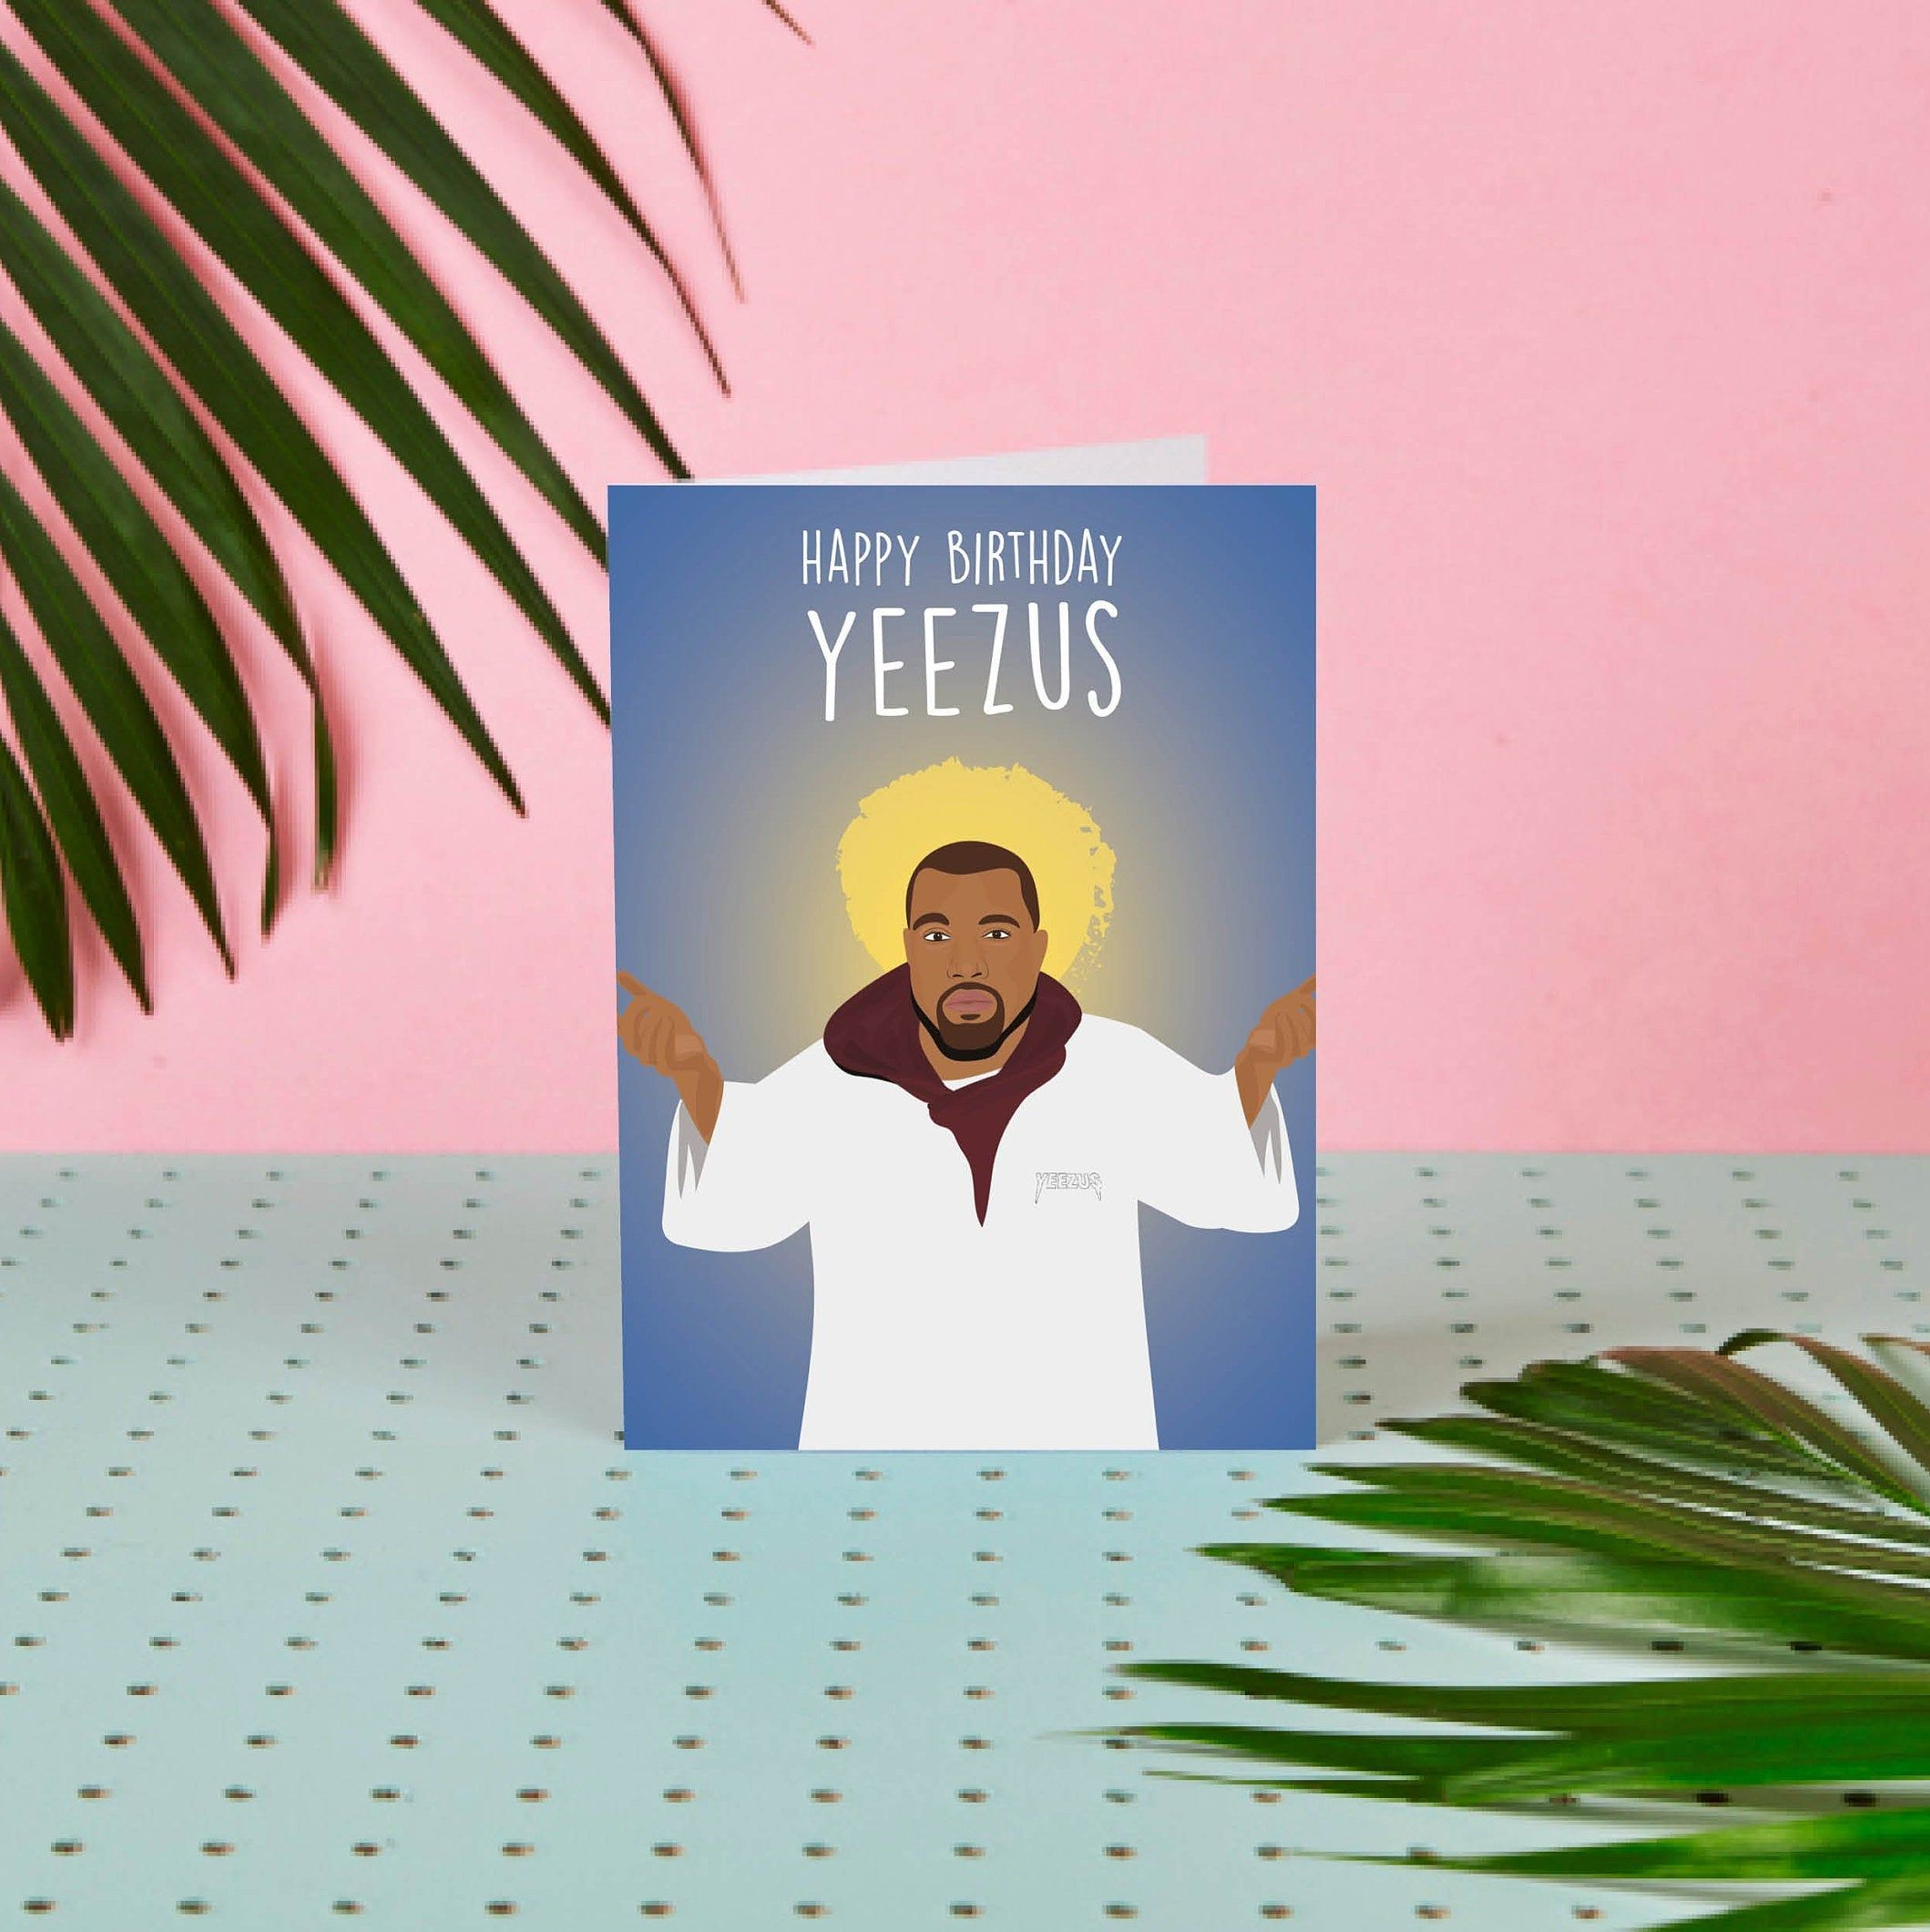 Happy Birthday Yeezus Christmas Card Kanye West Greeting Etsy Happy Birthday Christmas Cards Greetings